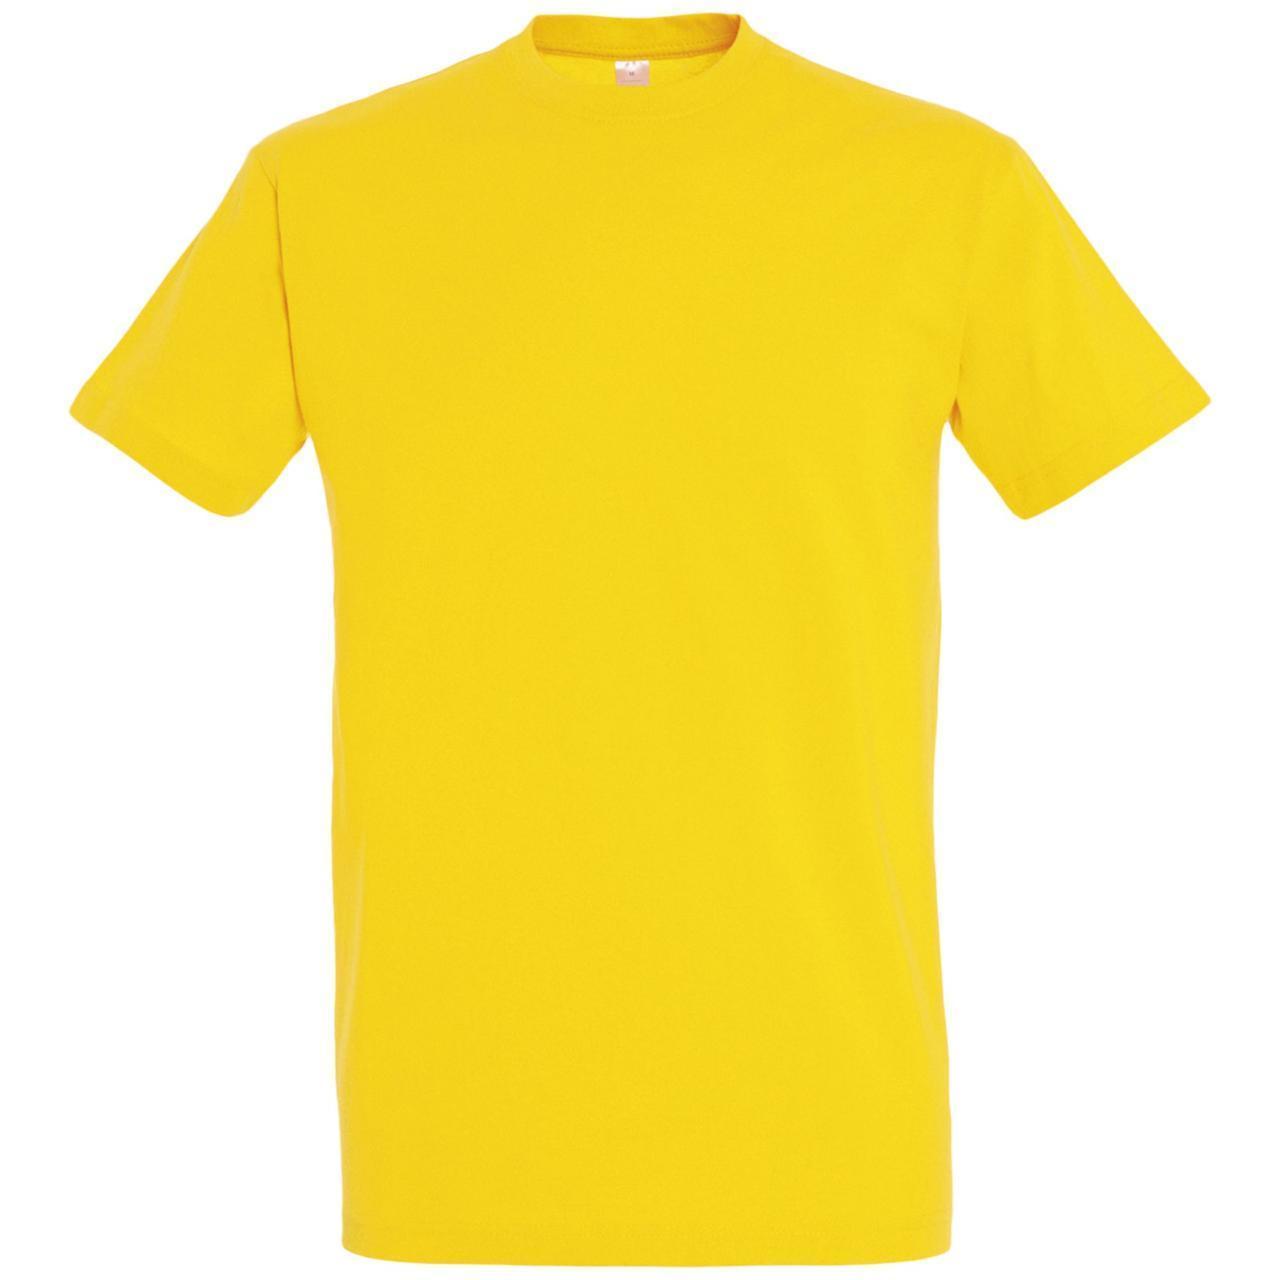 Oднотонная футболка   Желтая   160 гр.   M